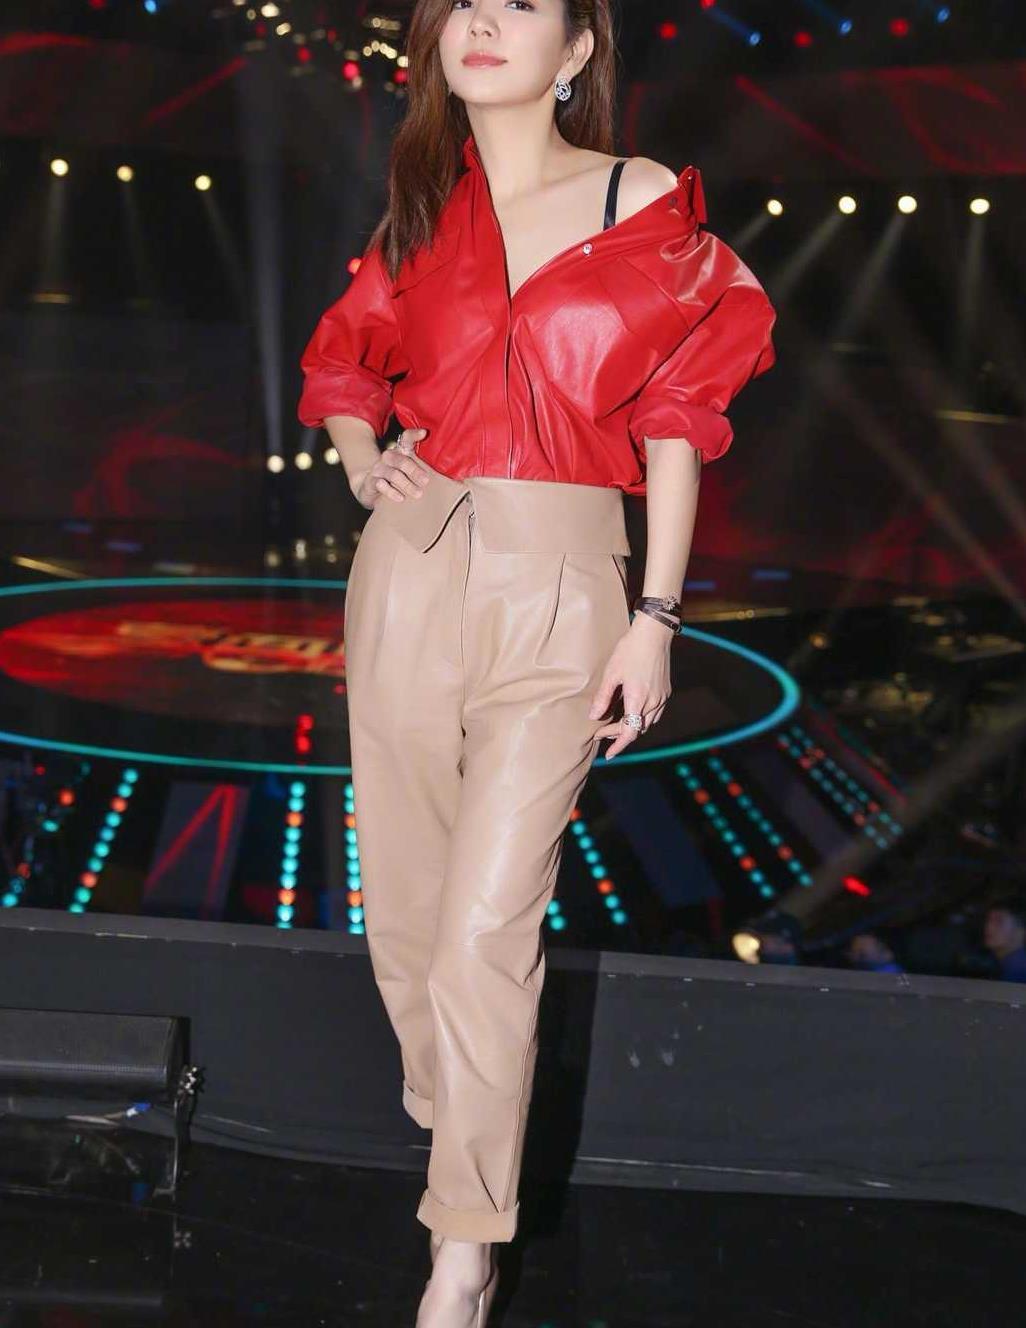 Ella陈嘉桦太会穿了,红色皮衣配奶茶色皮裤,不俗反而很高级